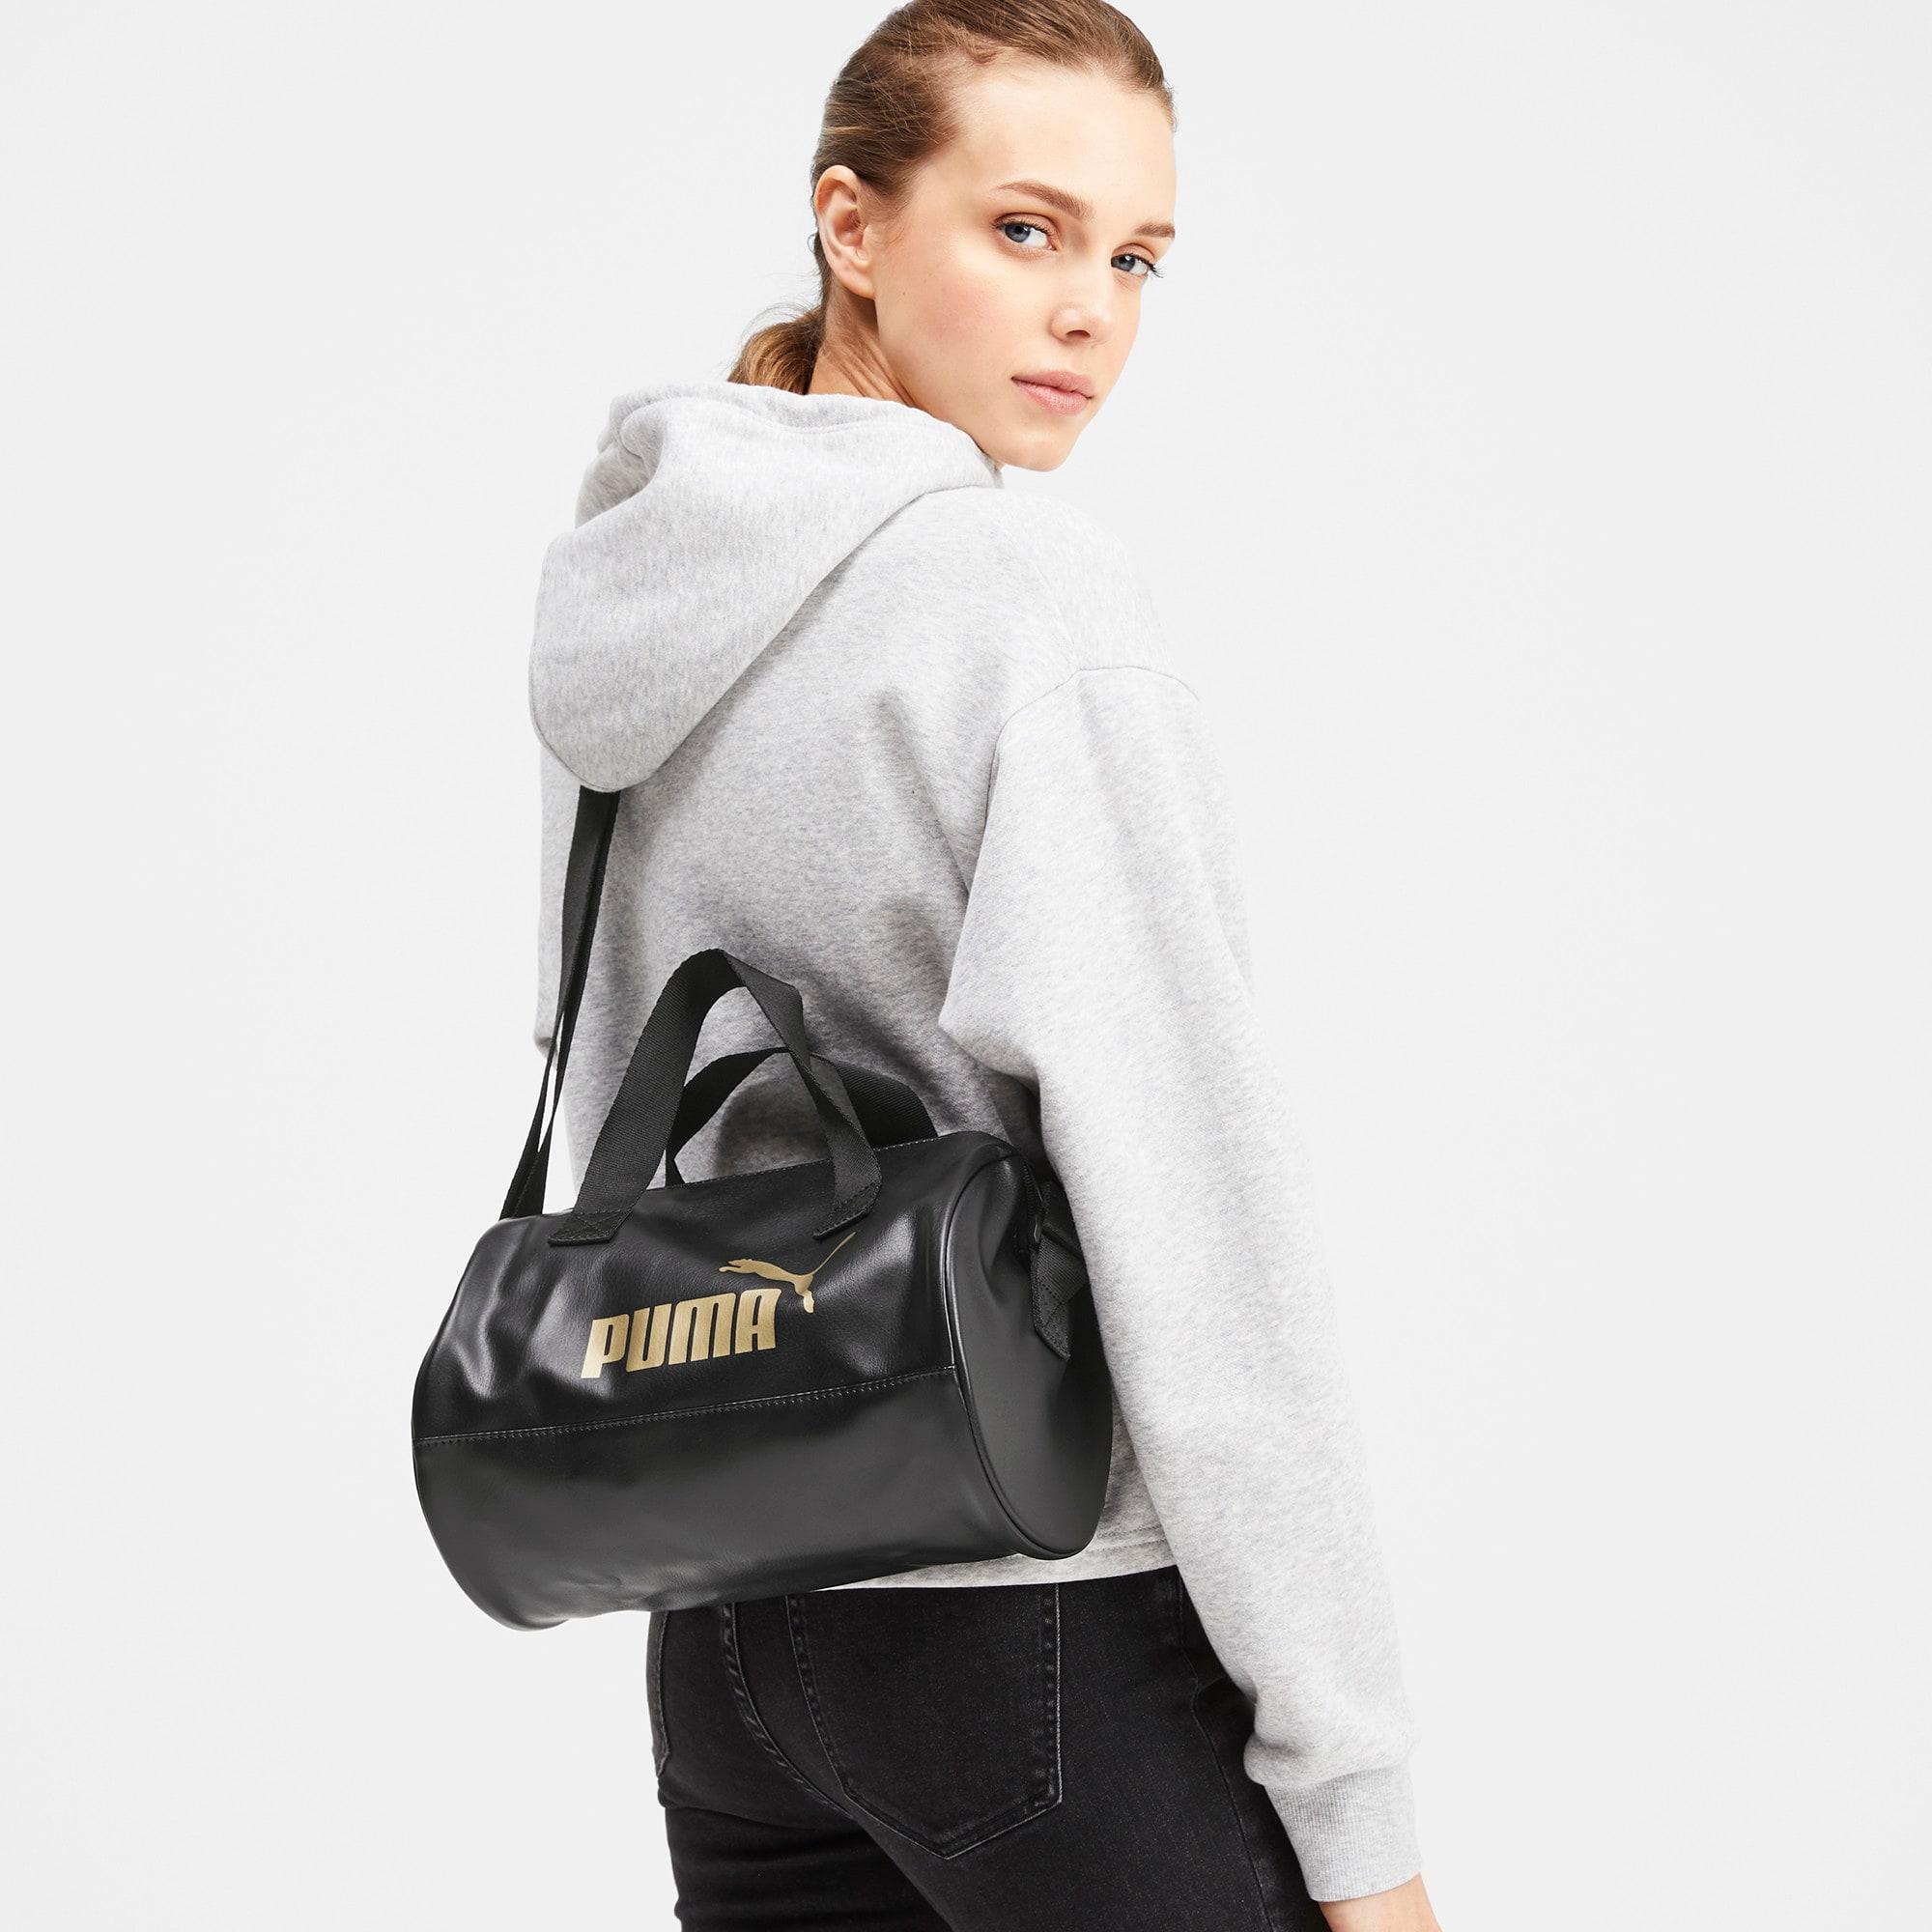 Thumbnail 2 of Up Women's Handbag, Puma Black-Gold, medium-IND